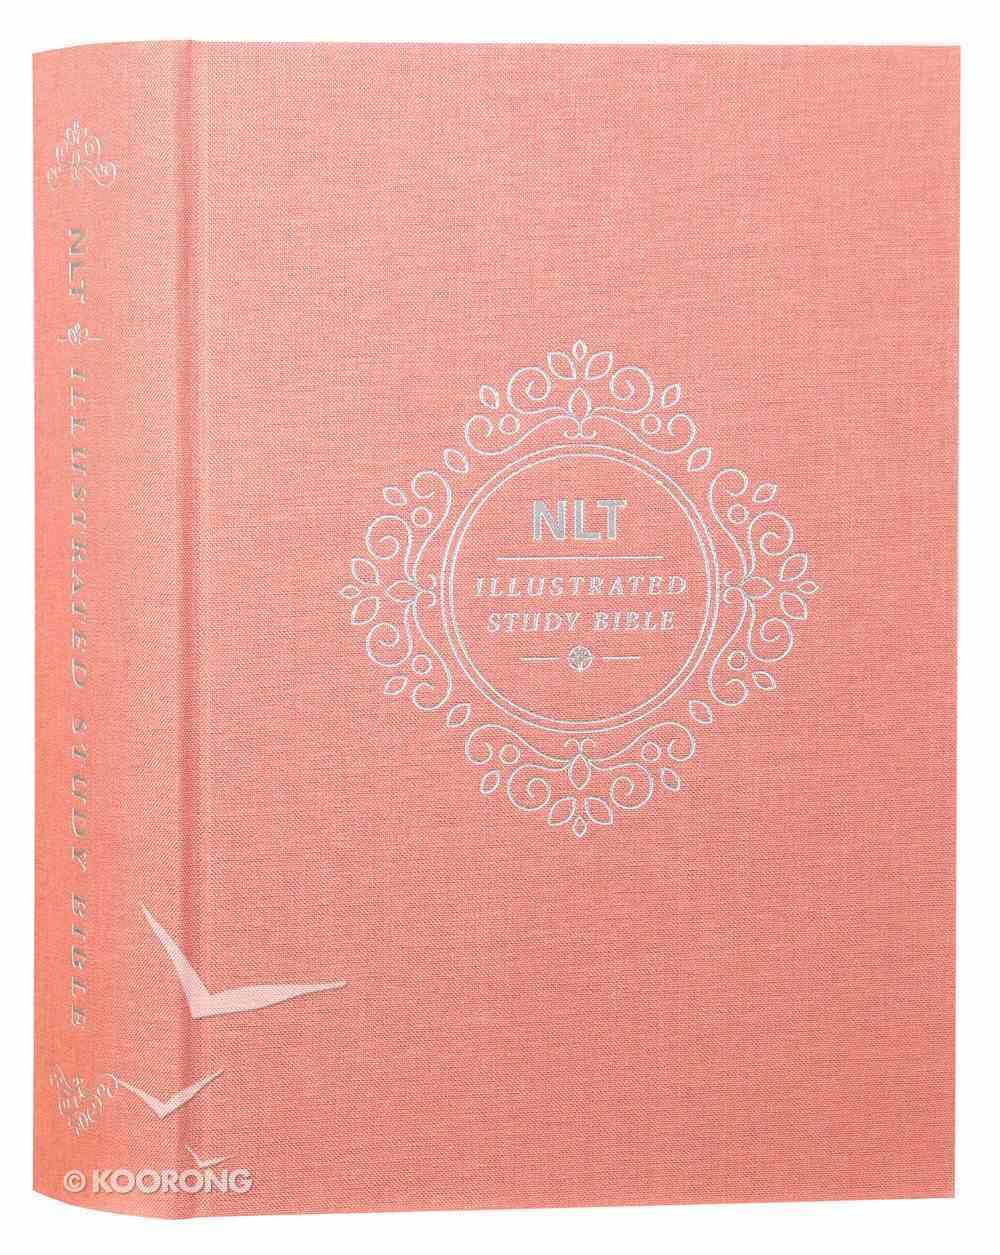 NLT Illustrated Study Bible Deluxe Linen Blush Rose (Black Letter Edition) Hardback